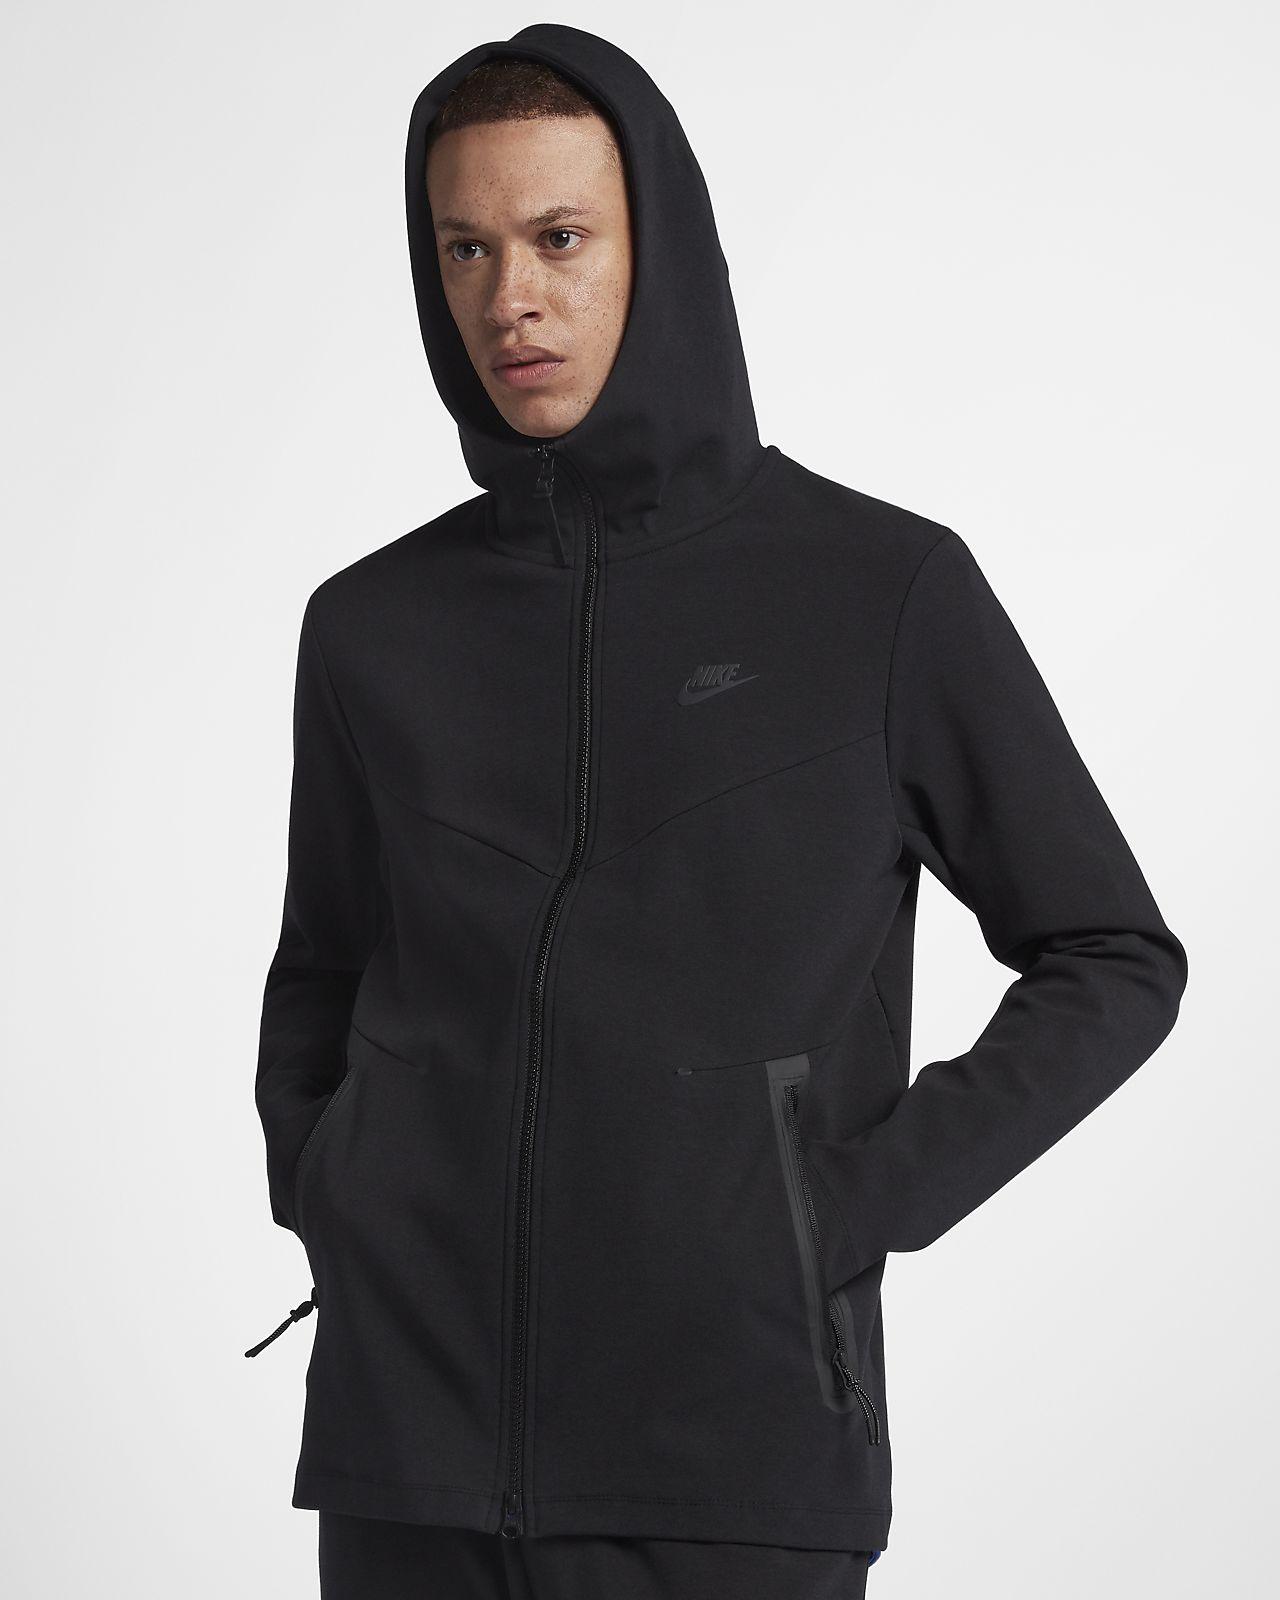 9c9fd5922bd7 Ανδρική μπλούζα με κουκούλα και φερμουάρ Nike Sportswear Tech Pack ...